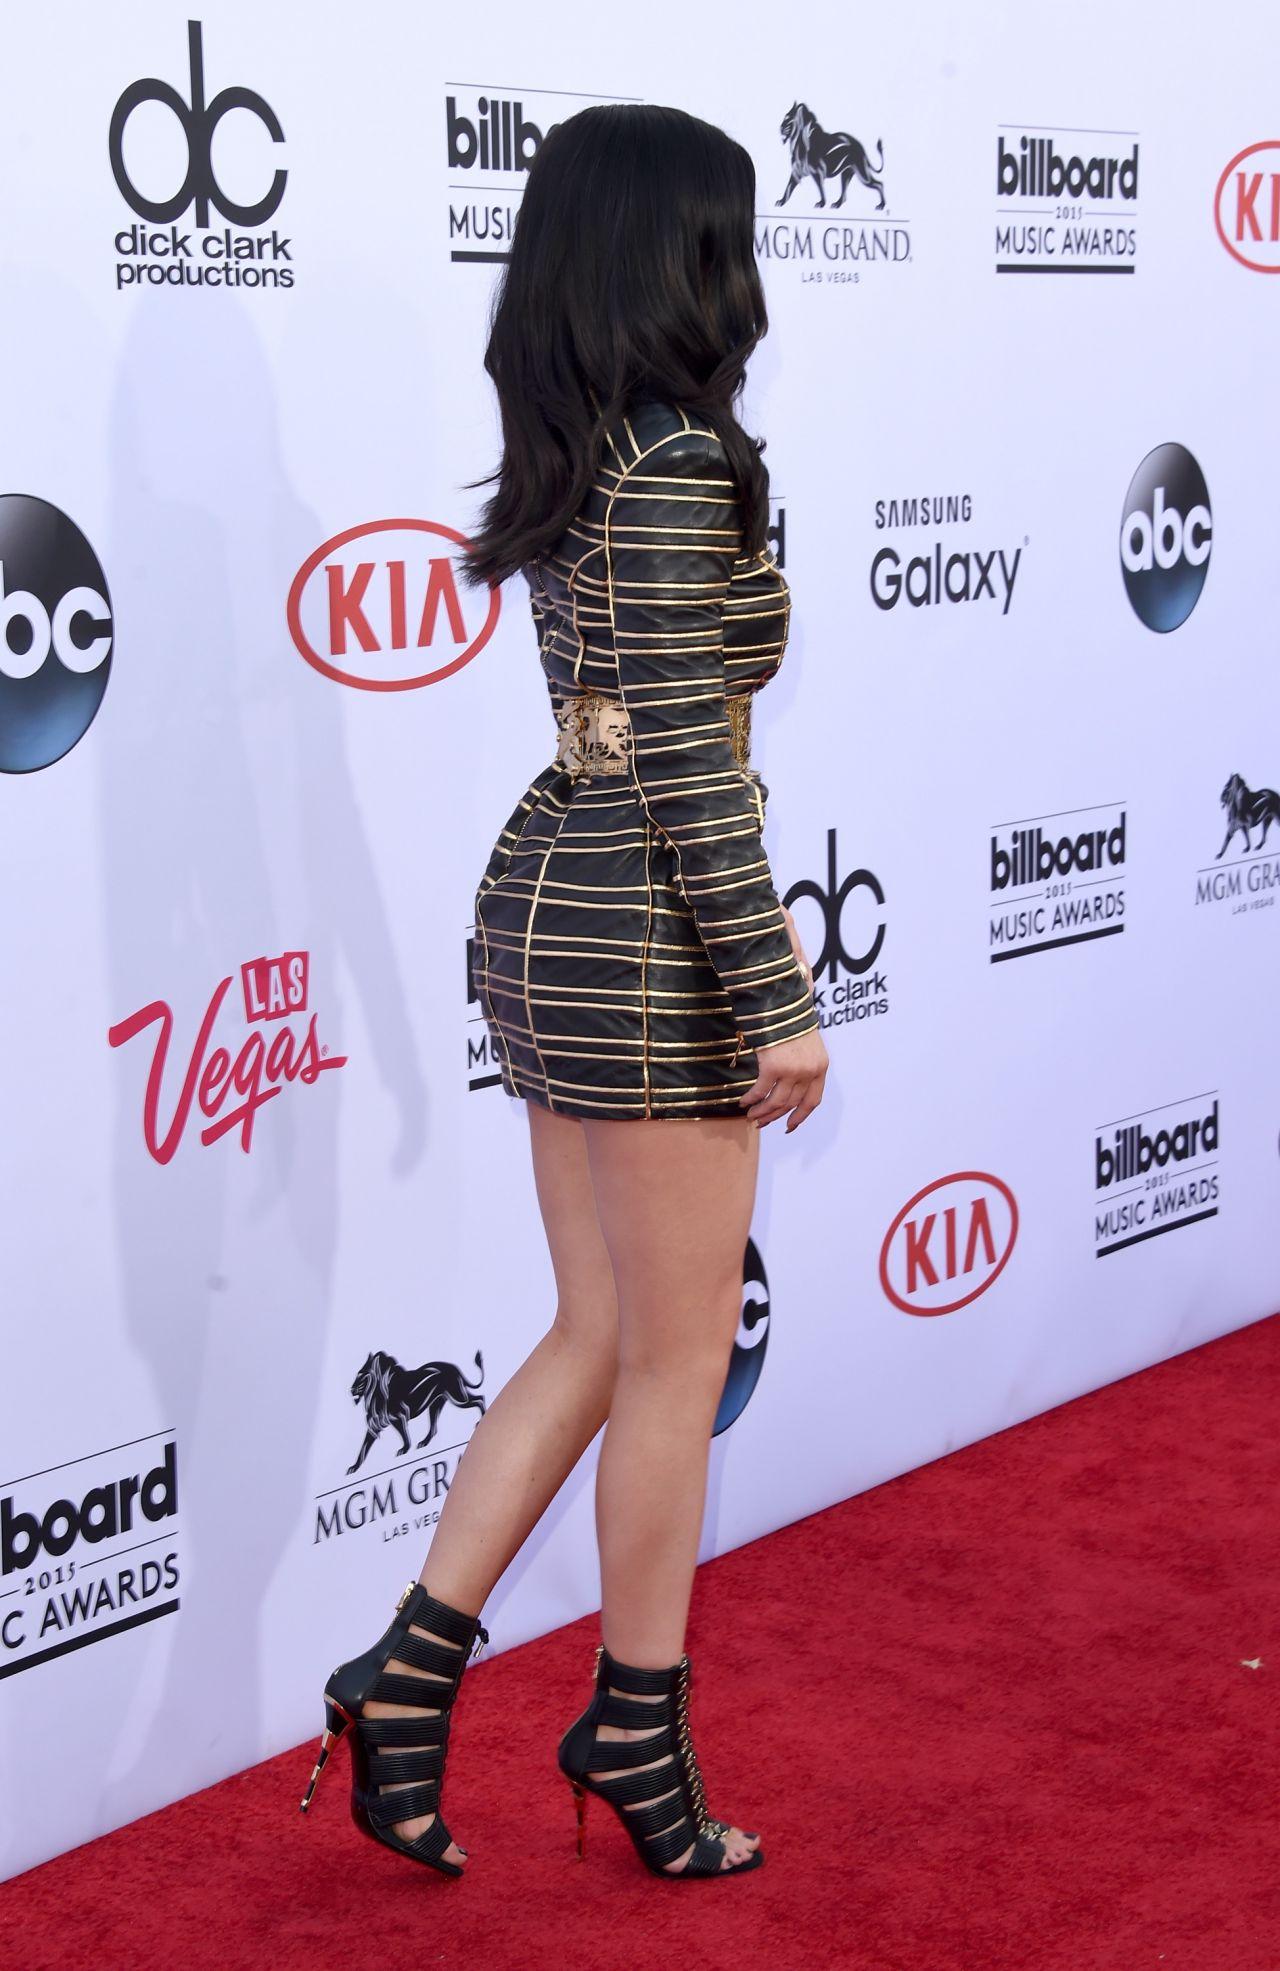 Billboard Music Awards 2016 The Best Hair And Makeup: 2015 Billboard Music Awards In Las Vegas